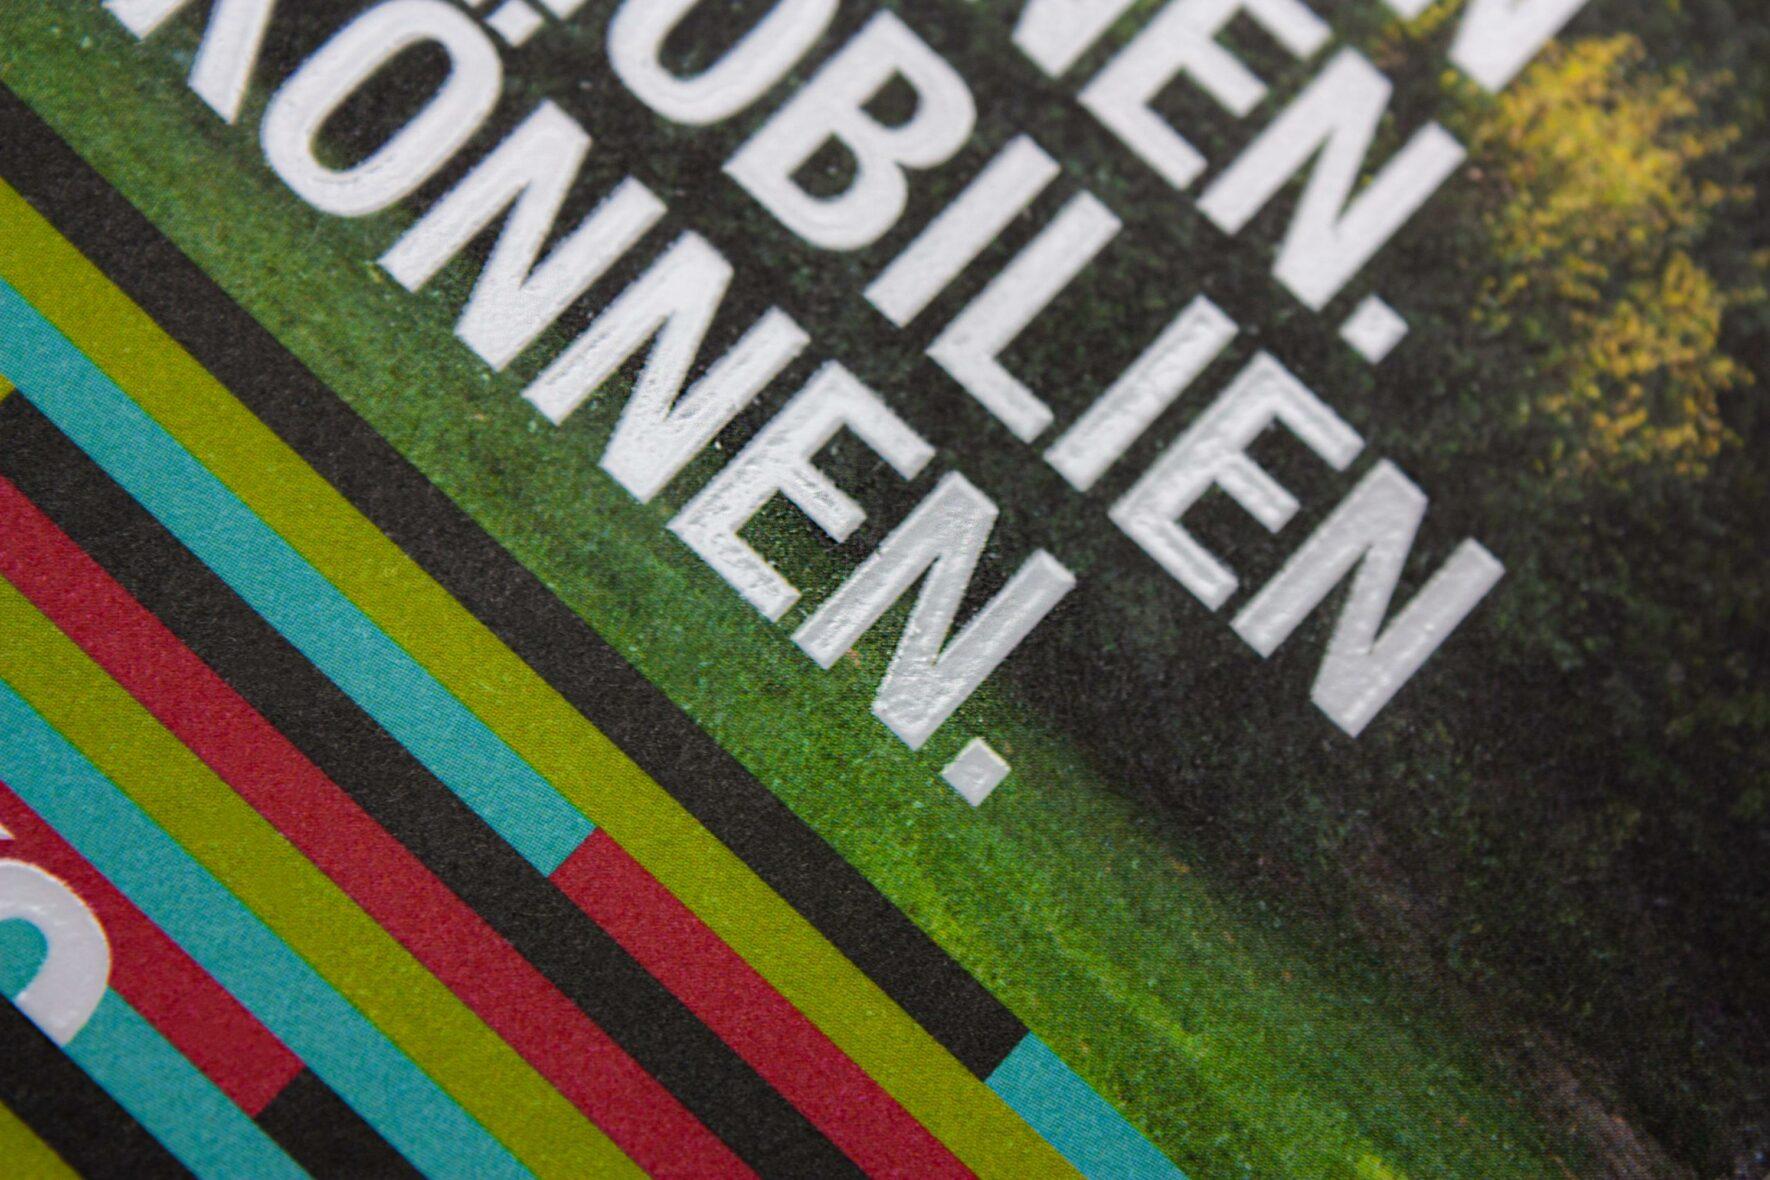 Flyergestaltung-Trencity-Print-FORMLOS-Berlin-2